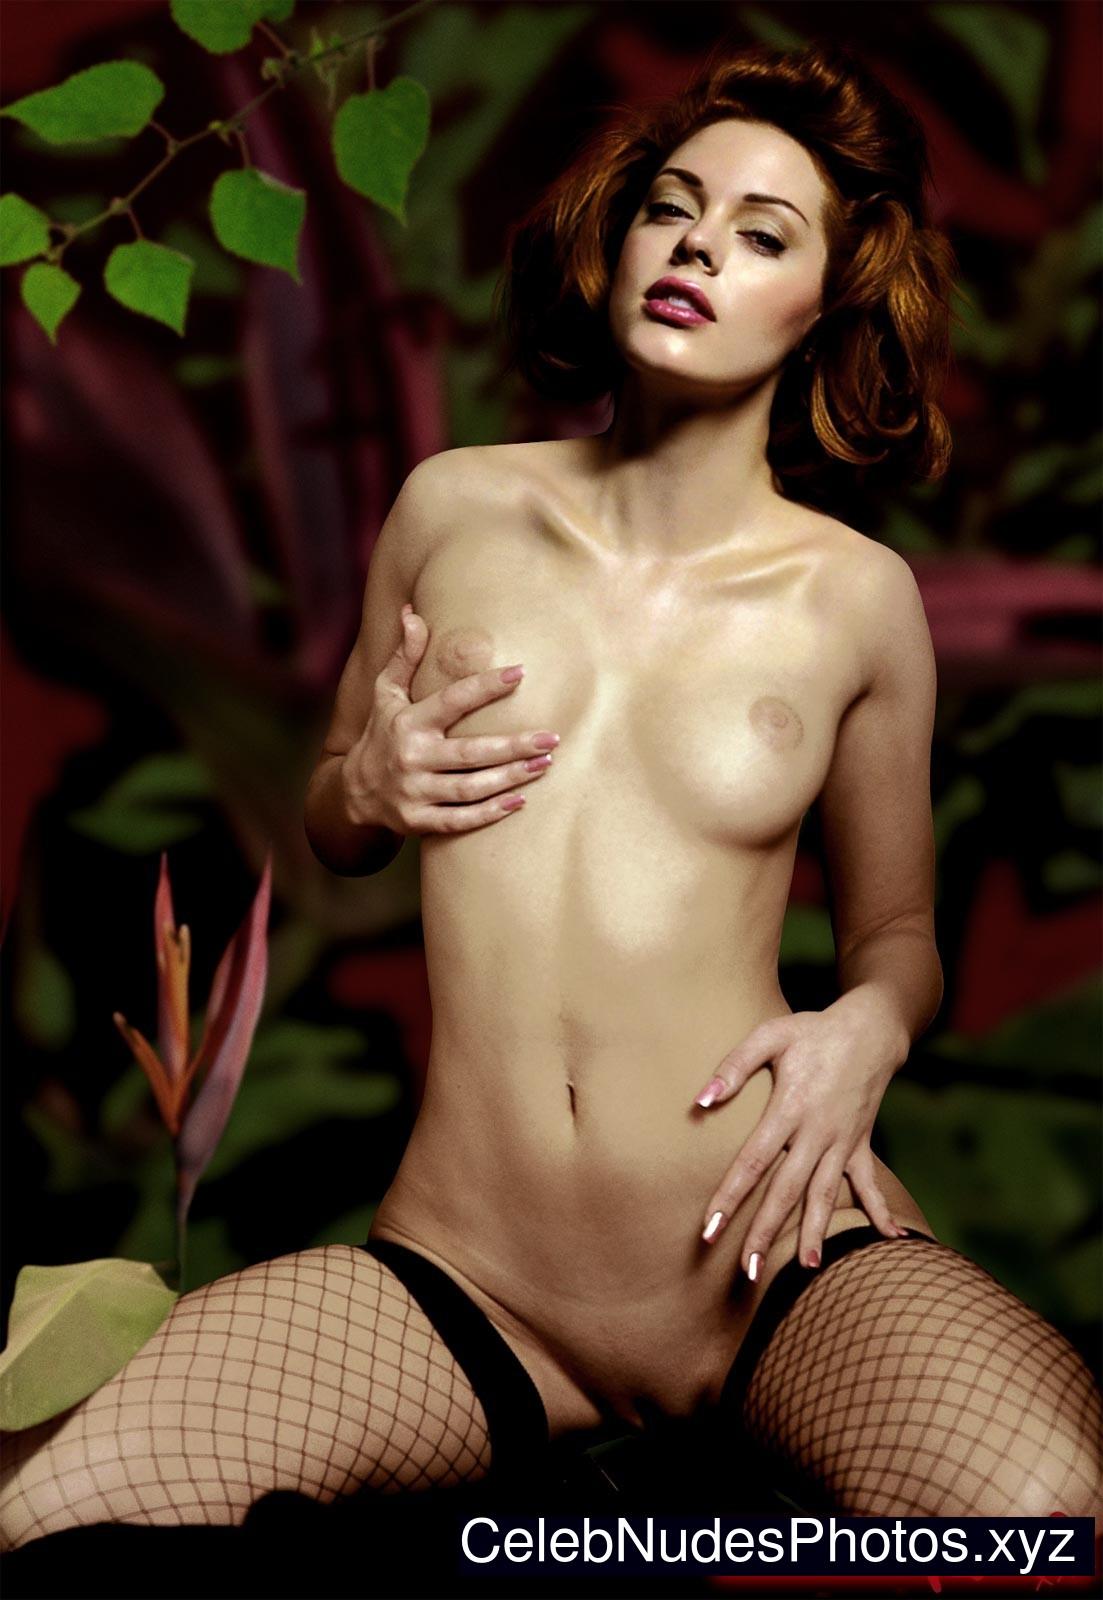 Naked pic mcgowan rose